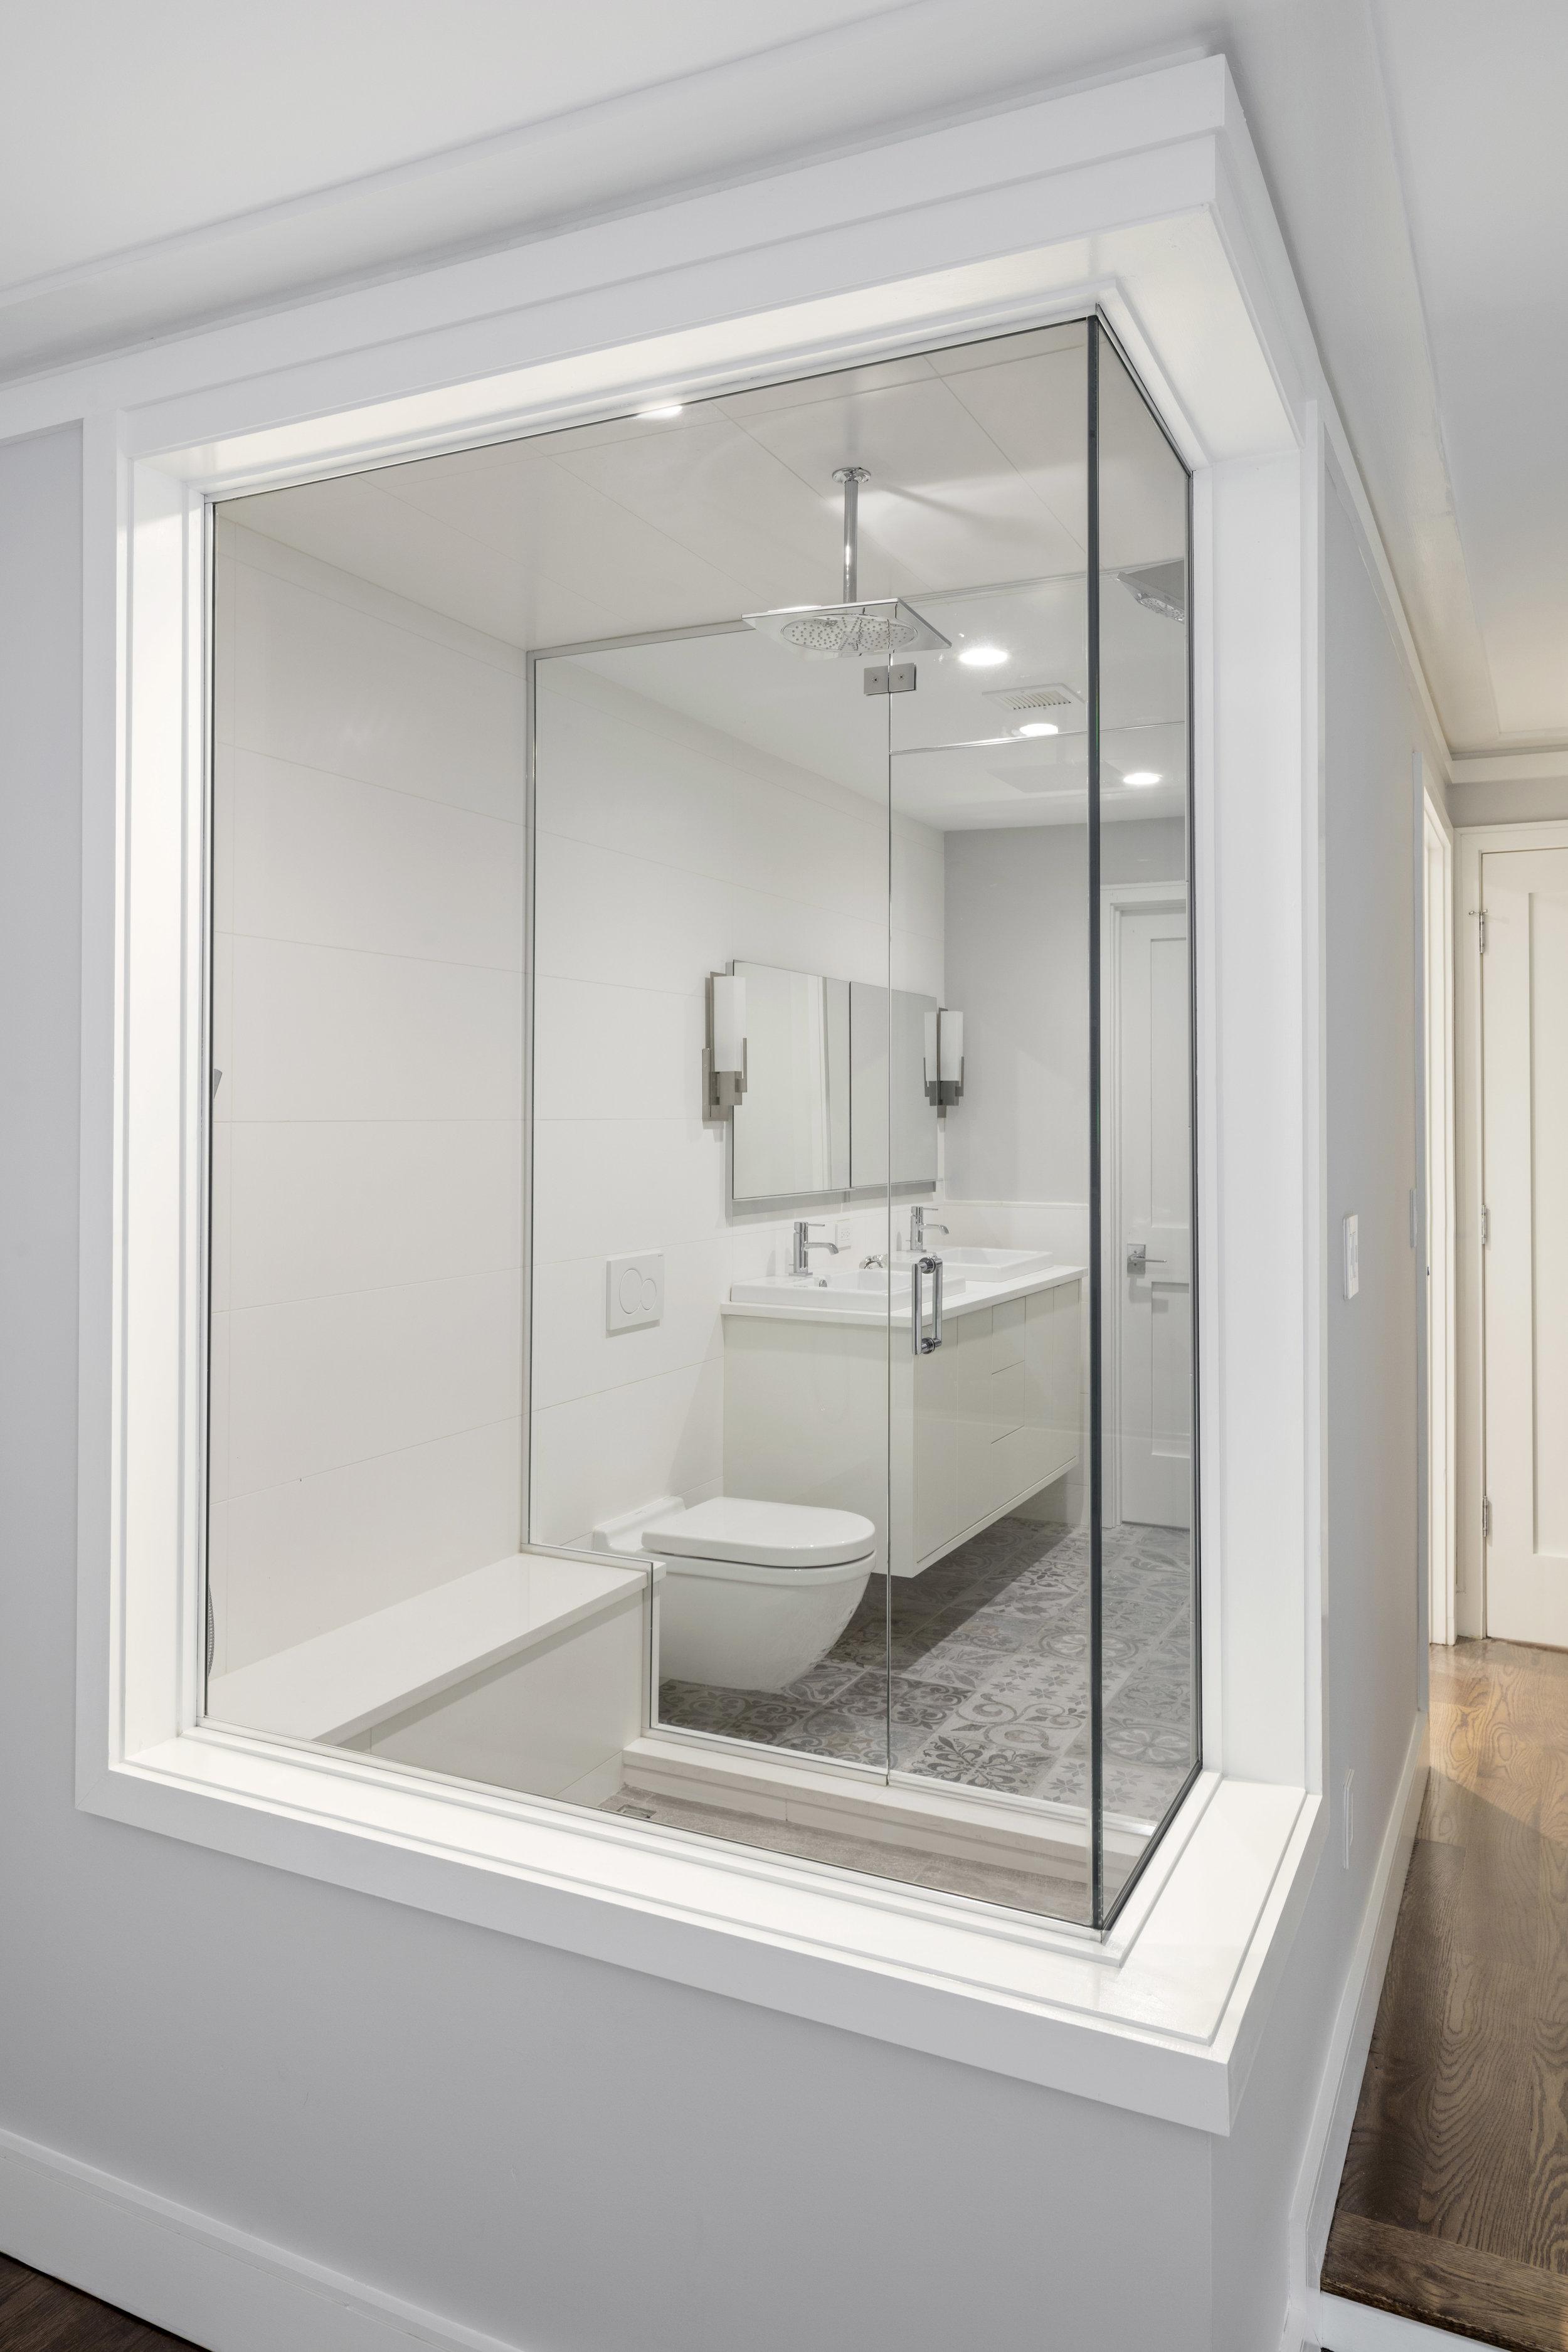 1 - Bath Shower lower.jpg